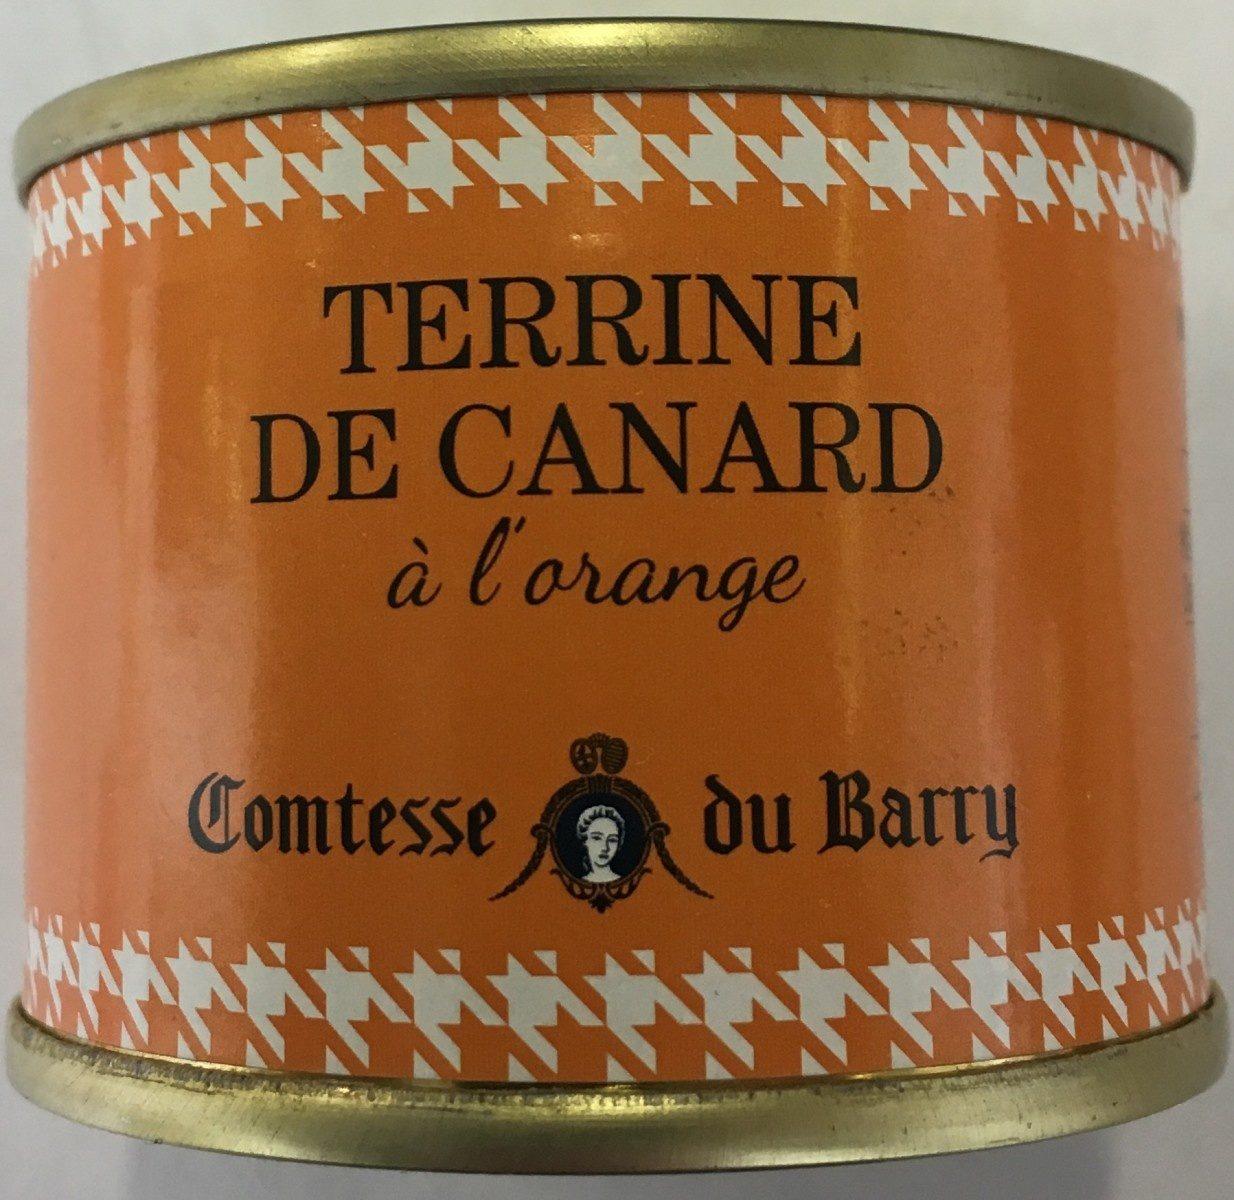 Terrine de canard à l'orange - Produit